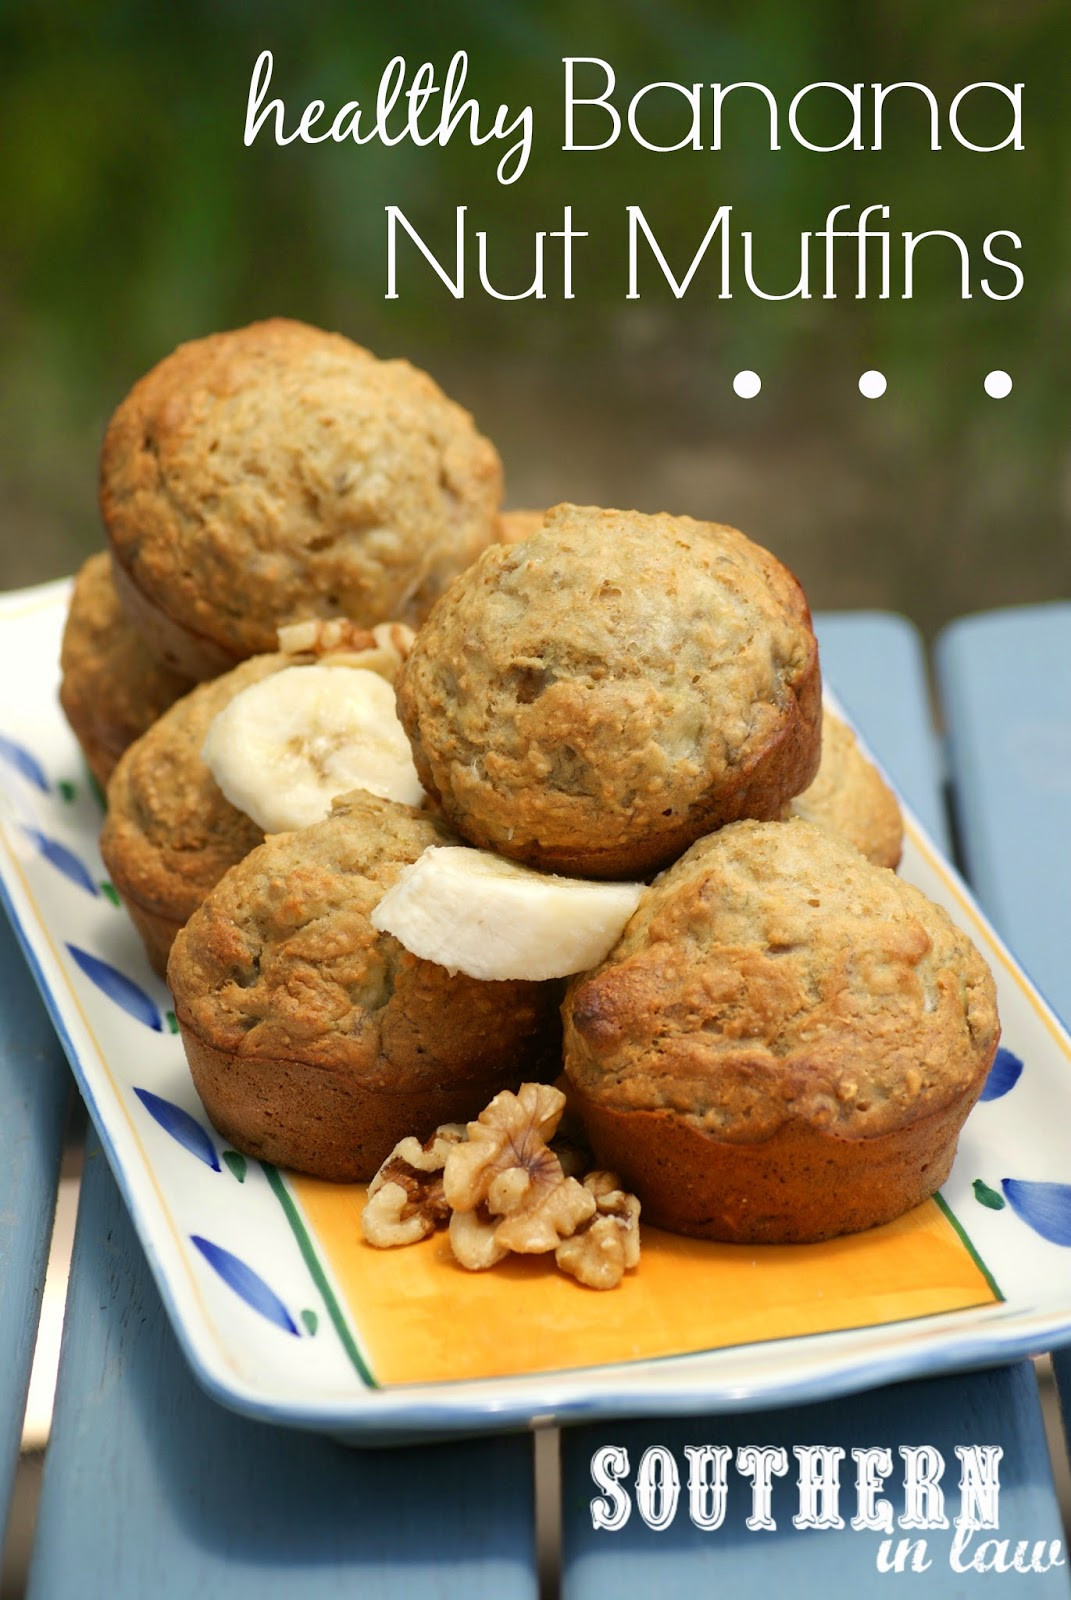 Banana Recipes Healthy  Southern In Law Recipe Healthy Banana Nut Muffins